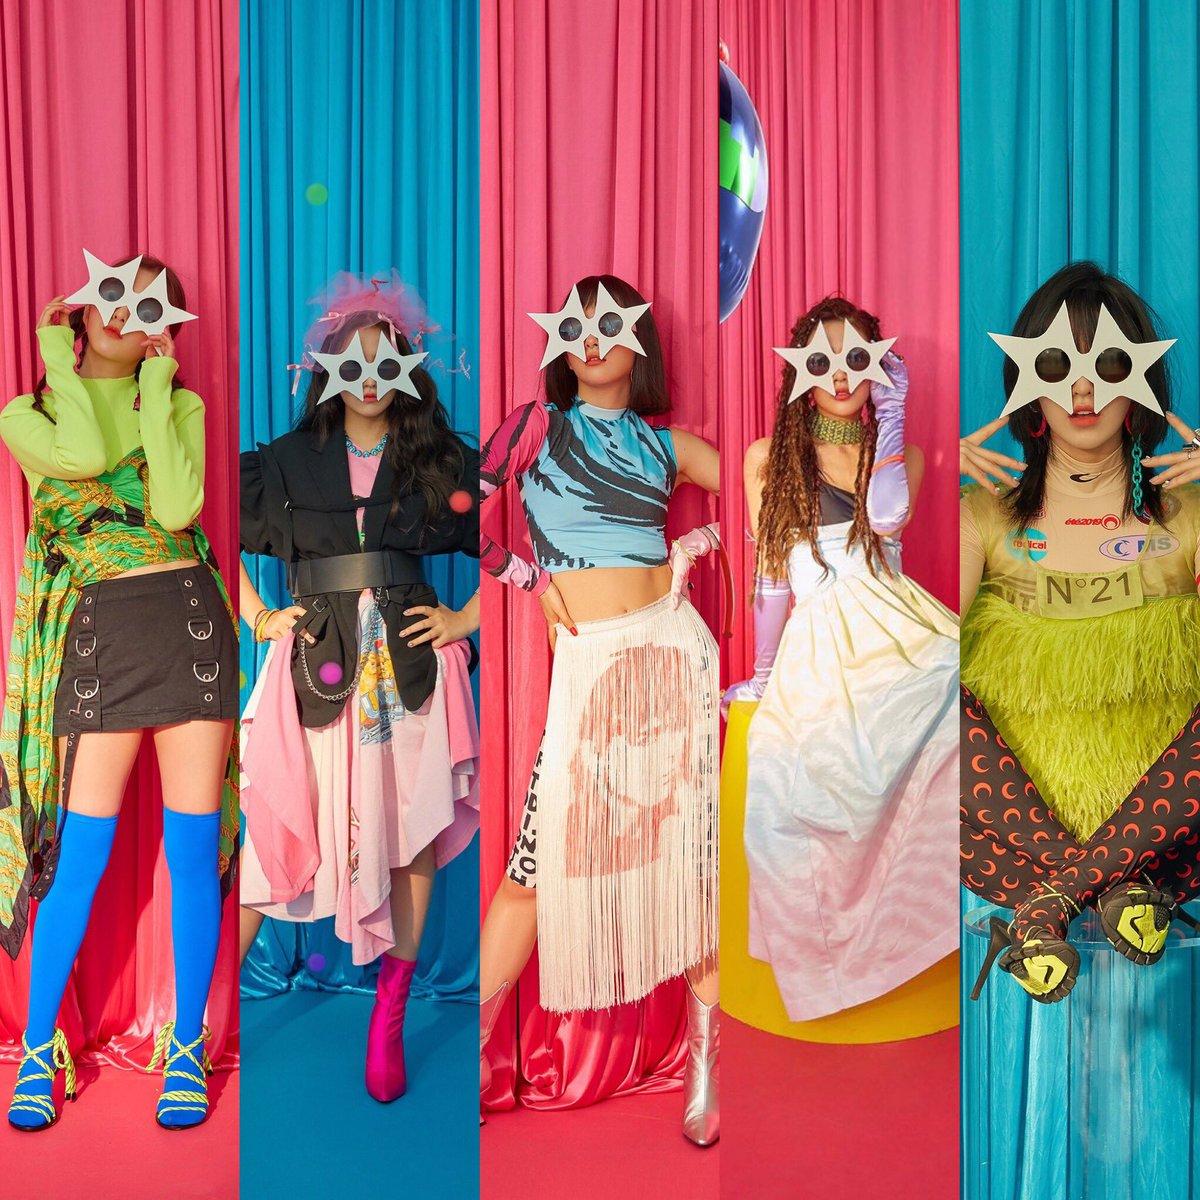 Tracklist oficial do ReVe Festival D1  1. Zimzalabim (title track) 2. Sunny Side Up! - Irene teaser 3. Milkshake - Seulgi teaser 4. Bing Bing - Wendy teaser 5. Parade - Joy teaser 6. LP - Yeri teaser  Pode vir AOTY  #TheReveFestivalD4 @RVsmtown<br>http://pic.twitter.com/HSnKdrdsYW